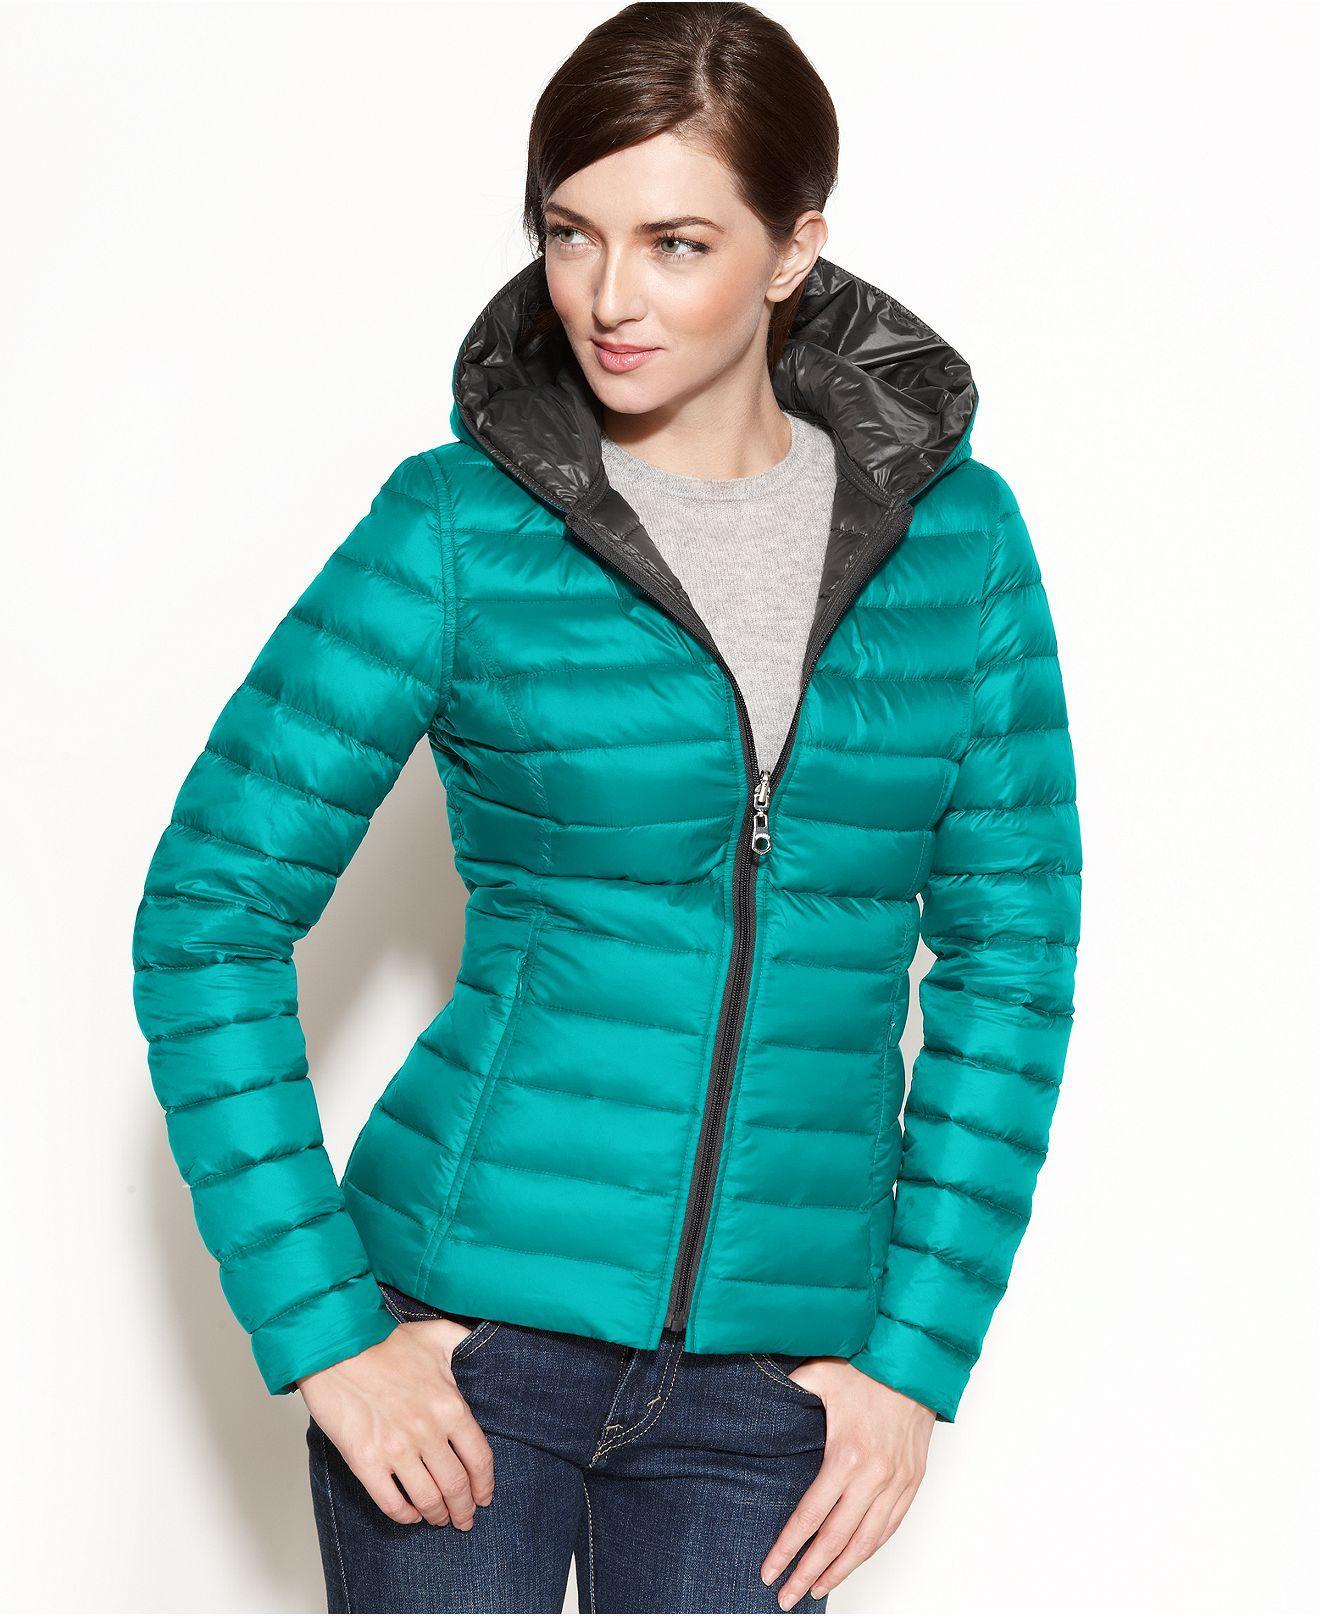 Nautica Reversible Hooded Quilted Packable Puffer Coats Women Macy S Reversible Clothing Coats For Women Puffer [ 1616 x 1320 Pixel ]